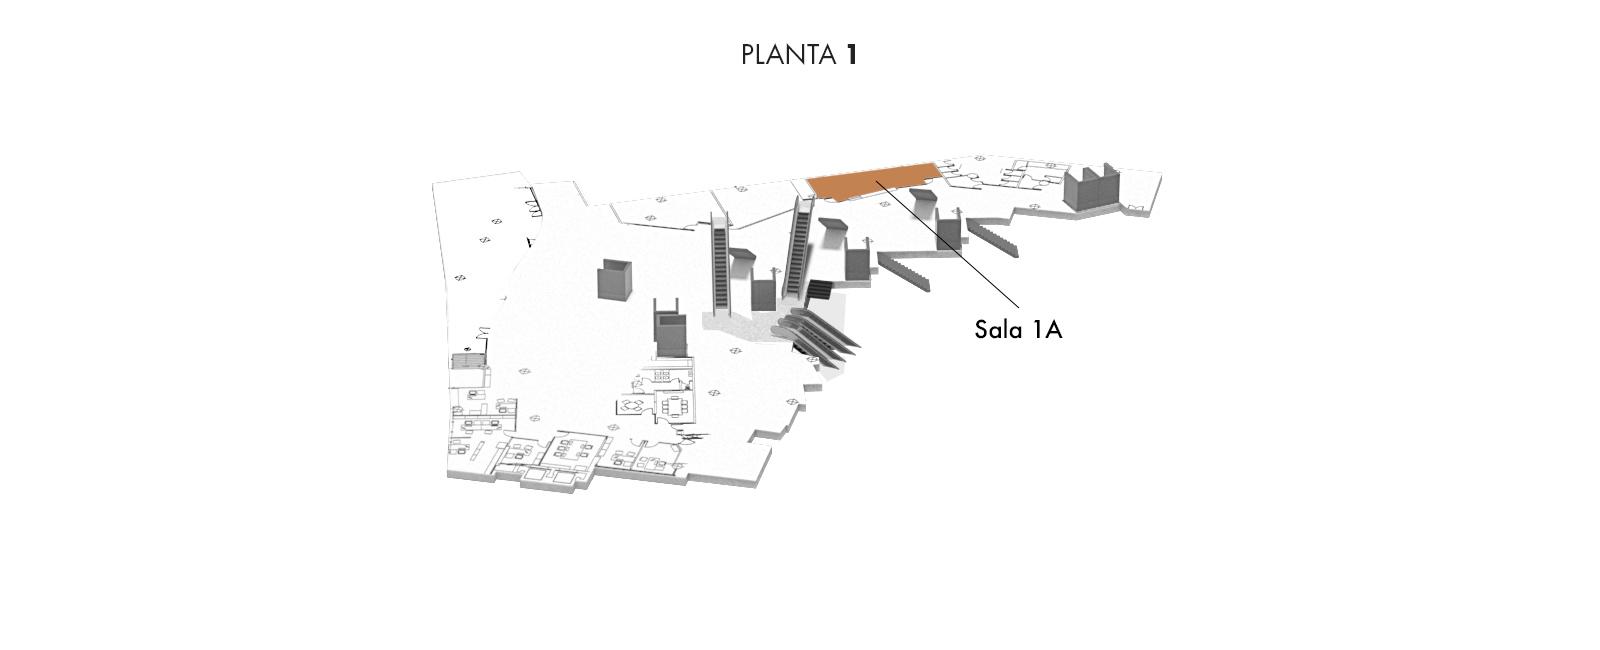 Sala 1A, Planta 1   Palacio Euskalduna Jauregia